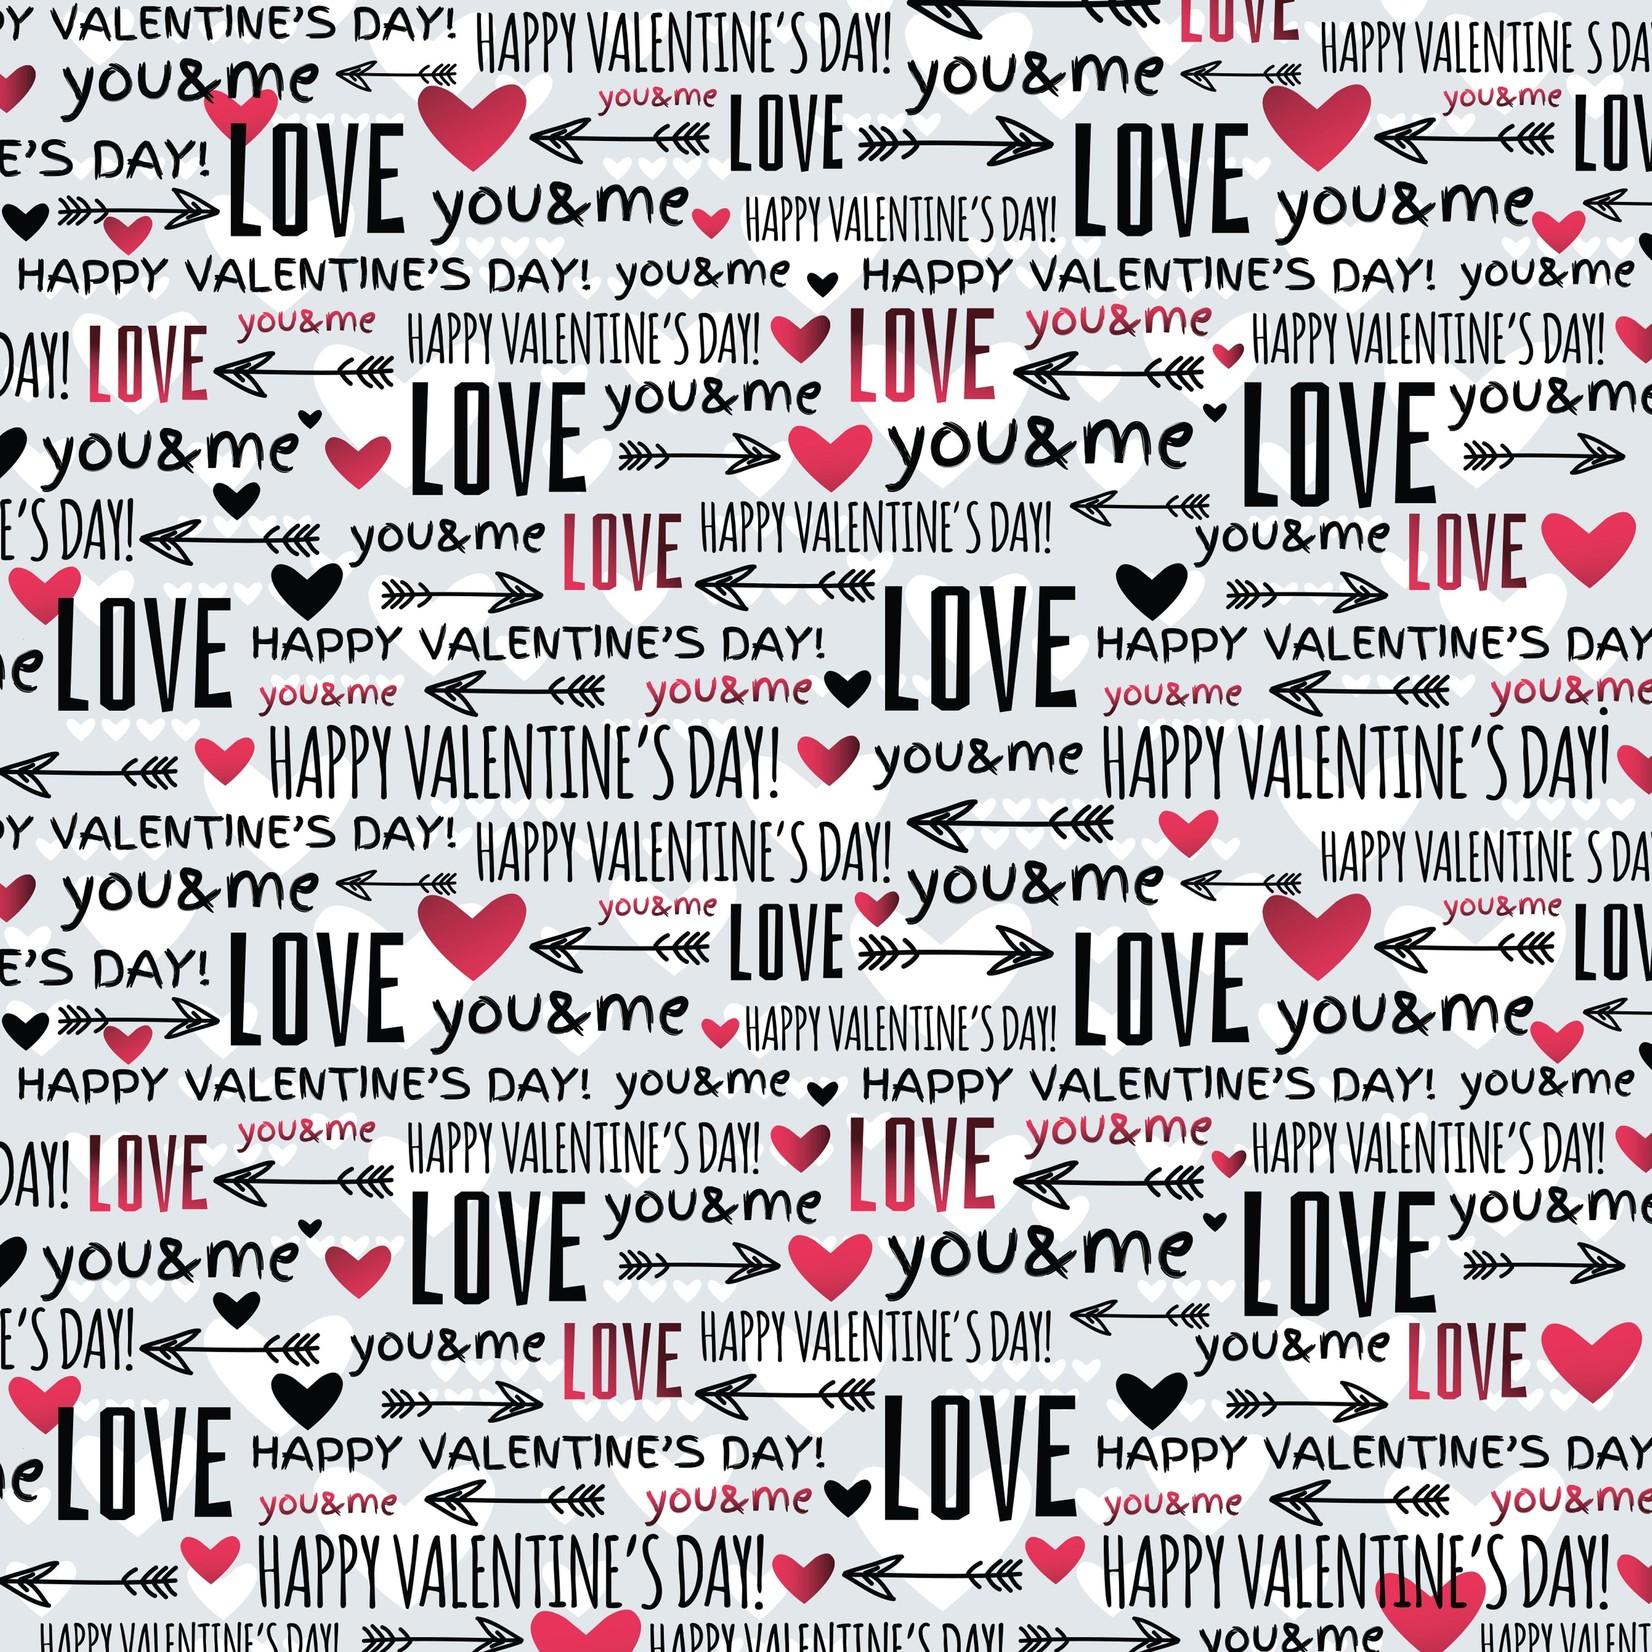 TVD You & Me Valentine